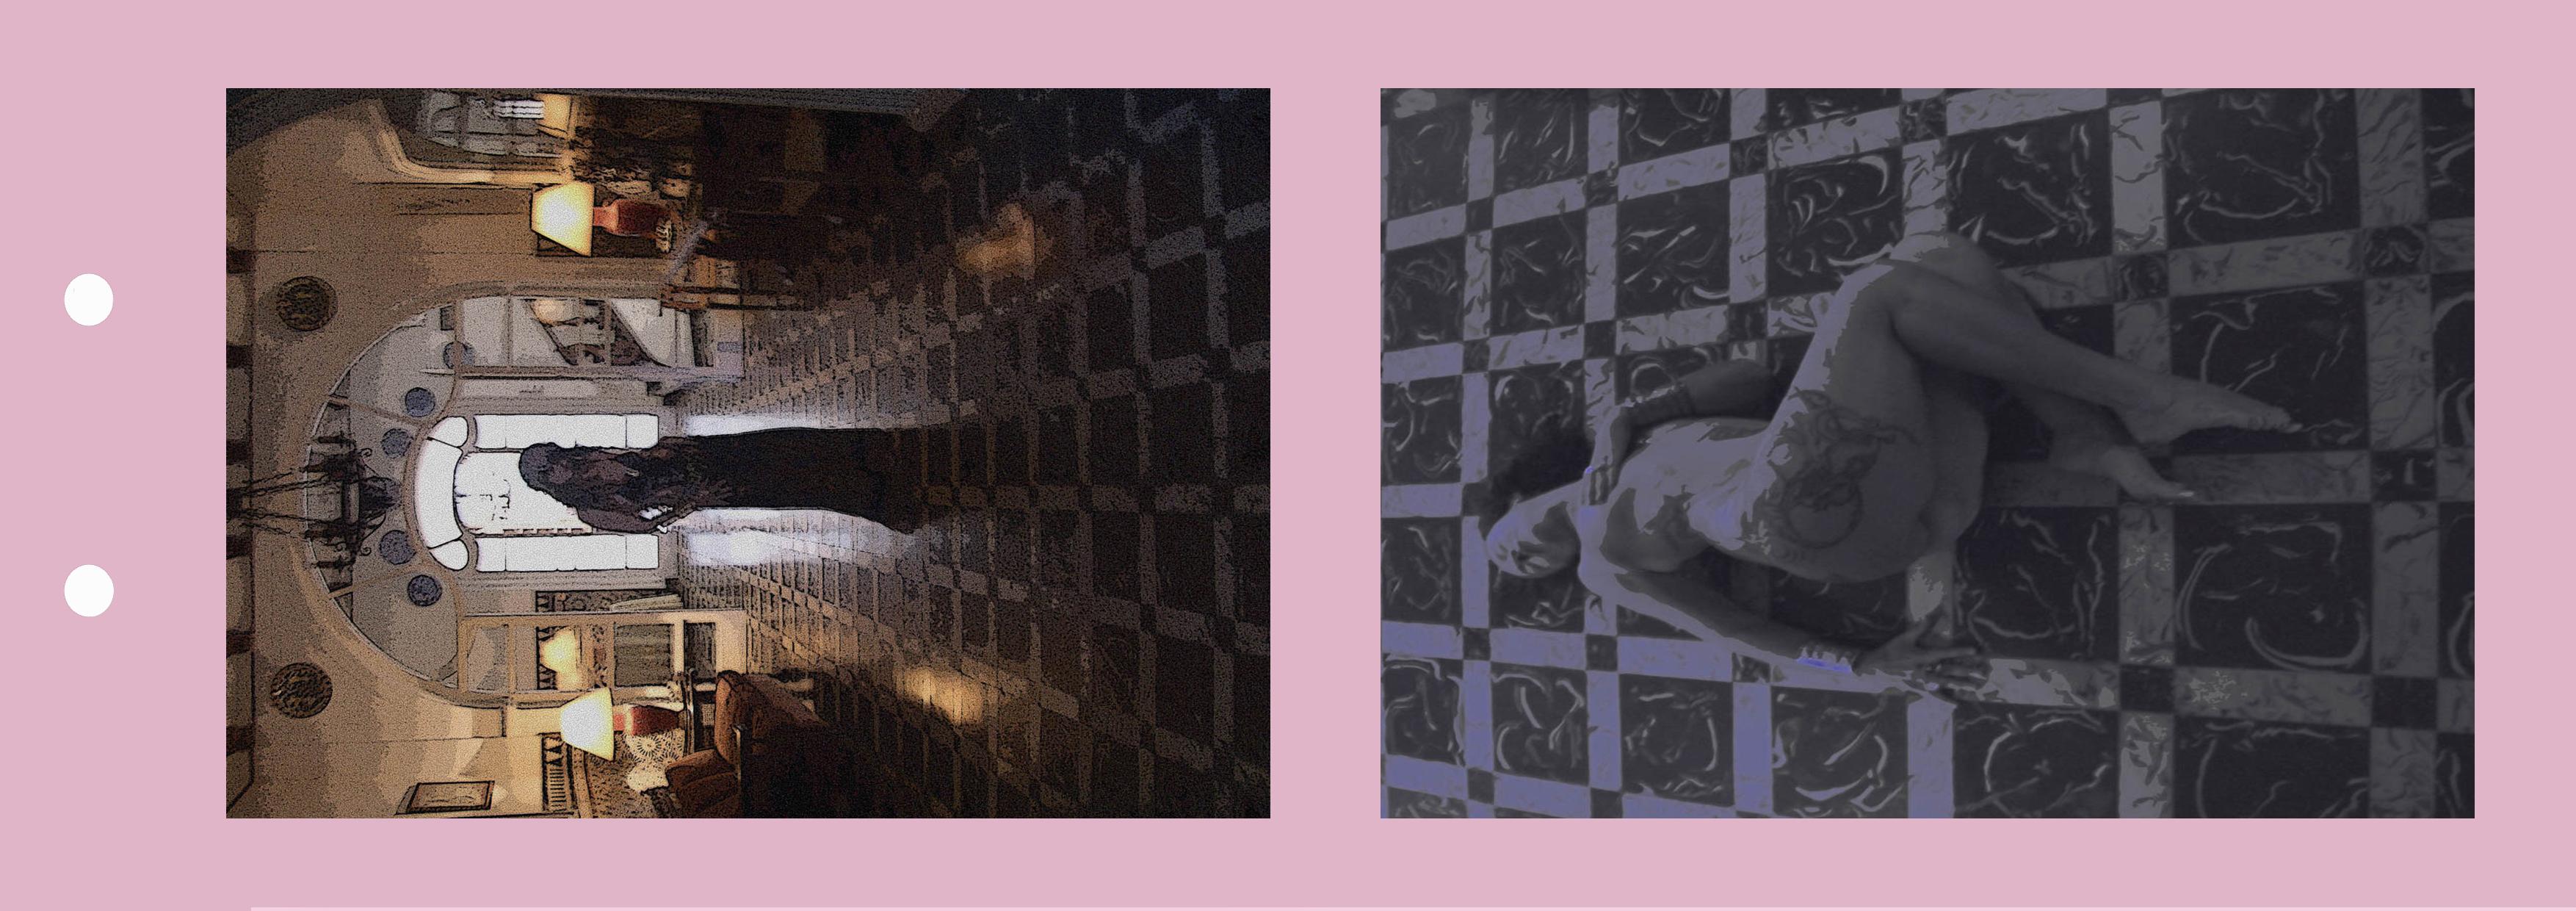 70-catalogo-ANONIMOS-casa+valenciana-modernista.jpg